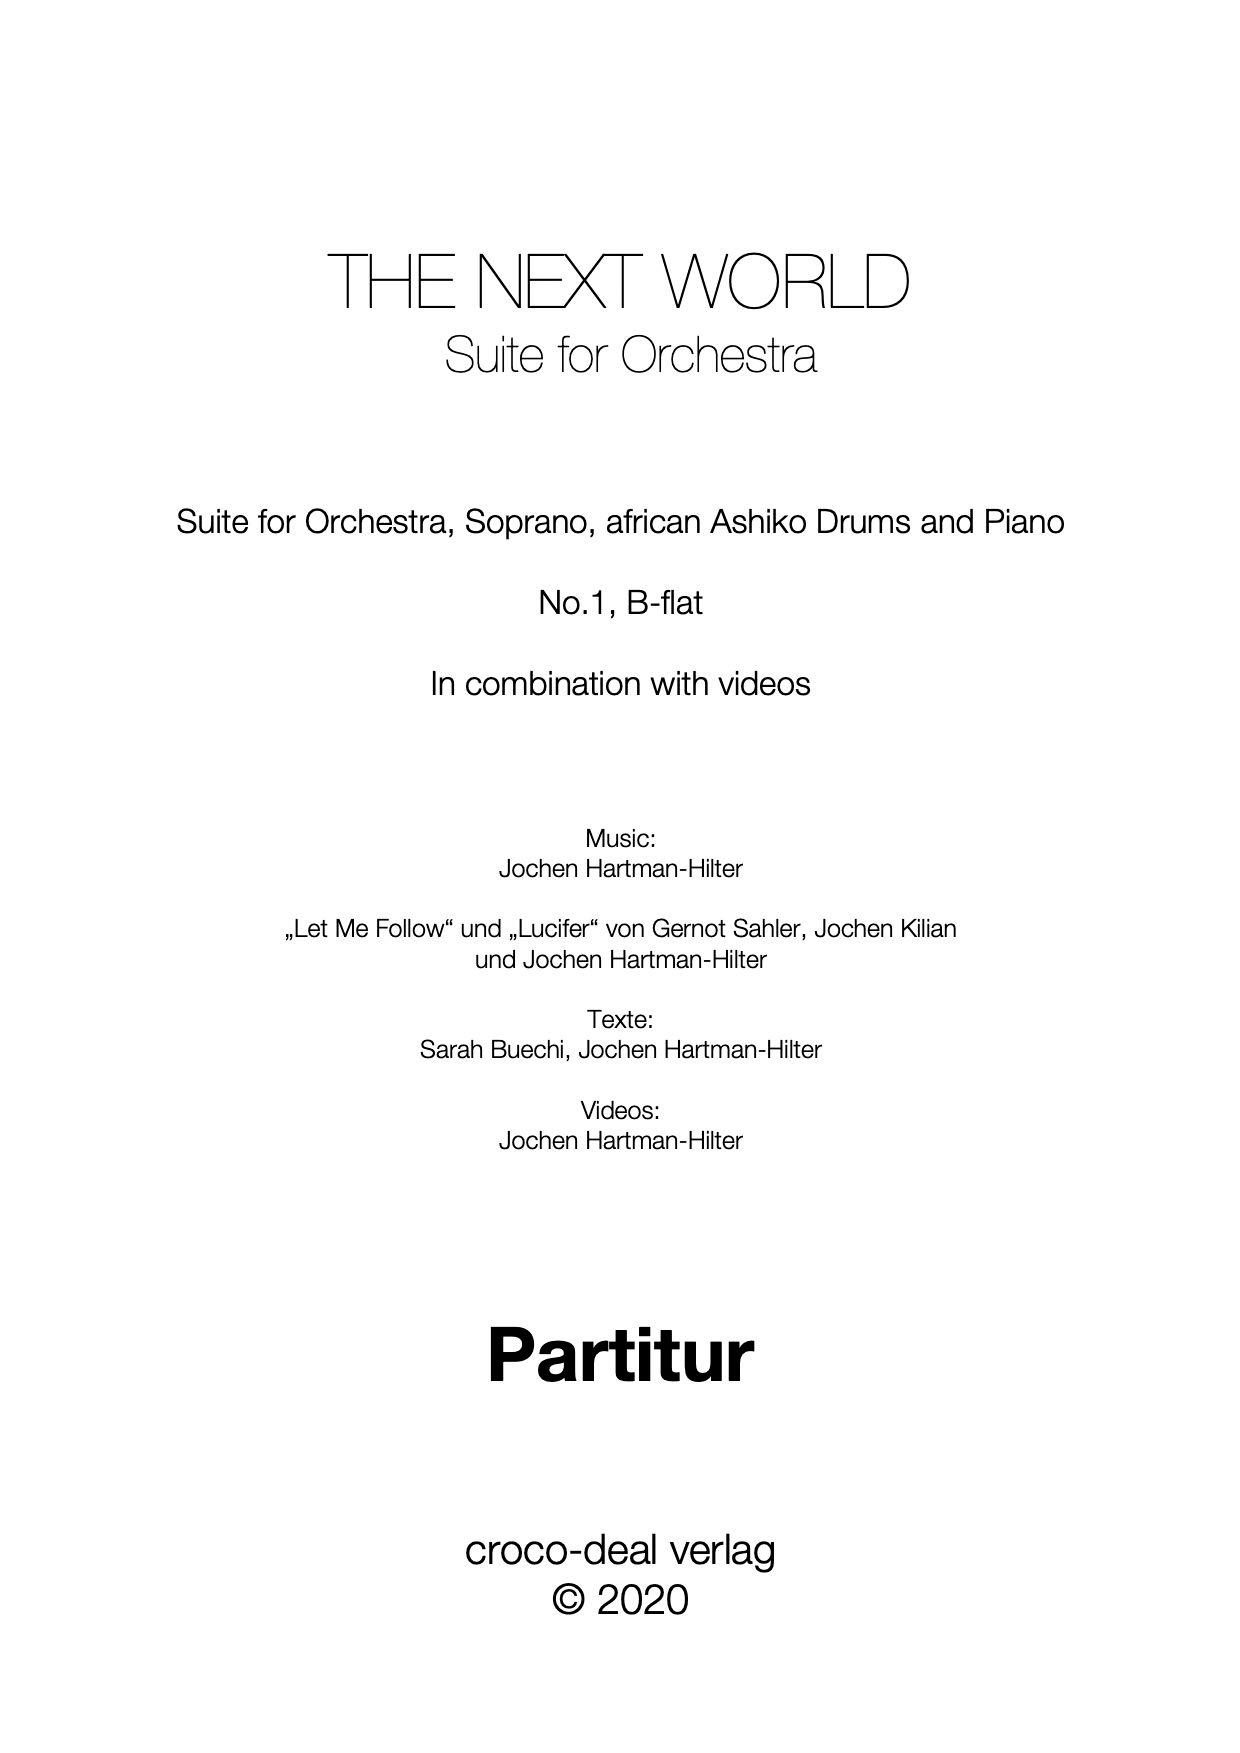 THE NEXT WORLD - Suite für Orchester, Partitur